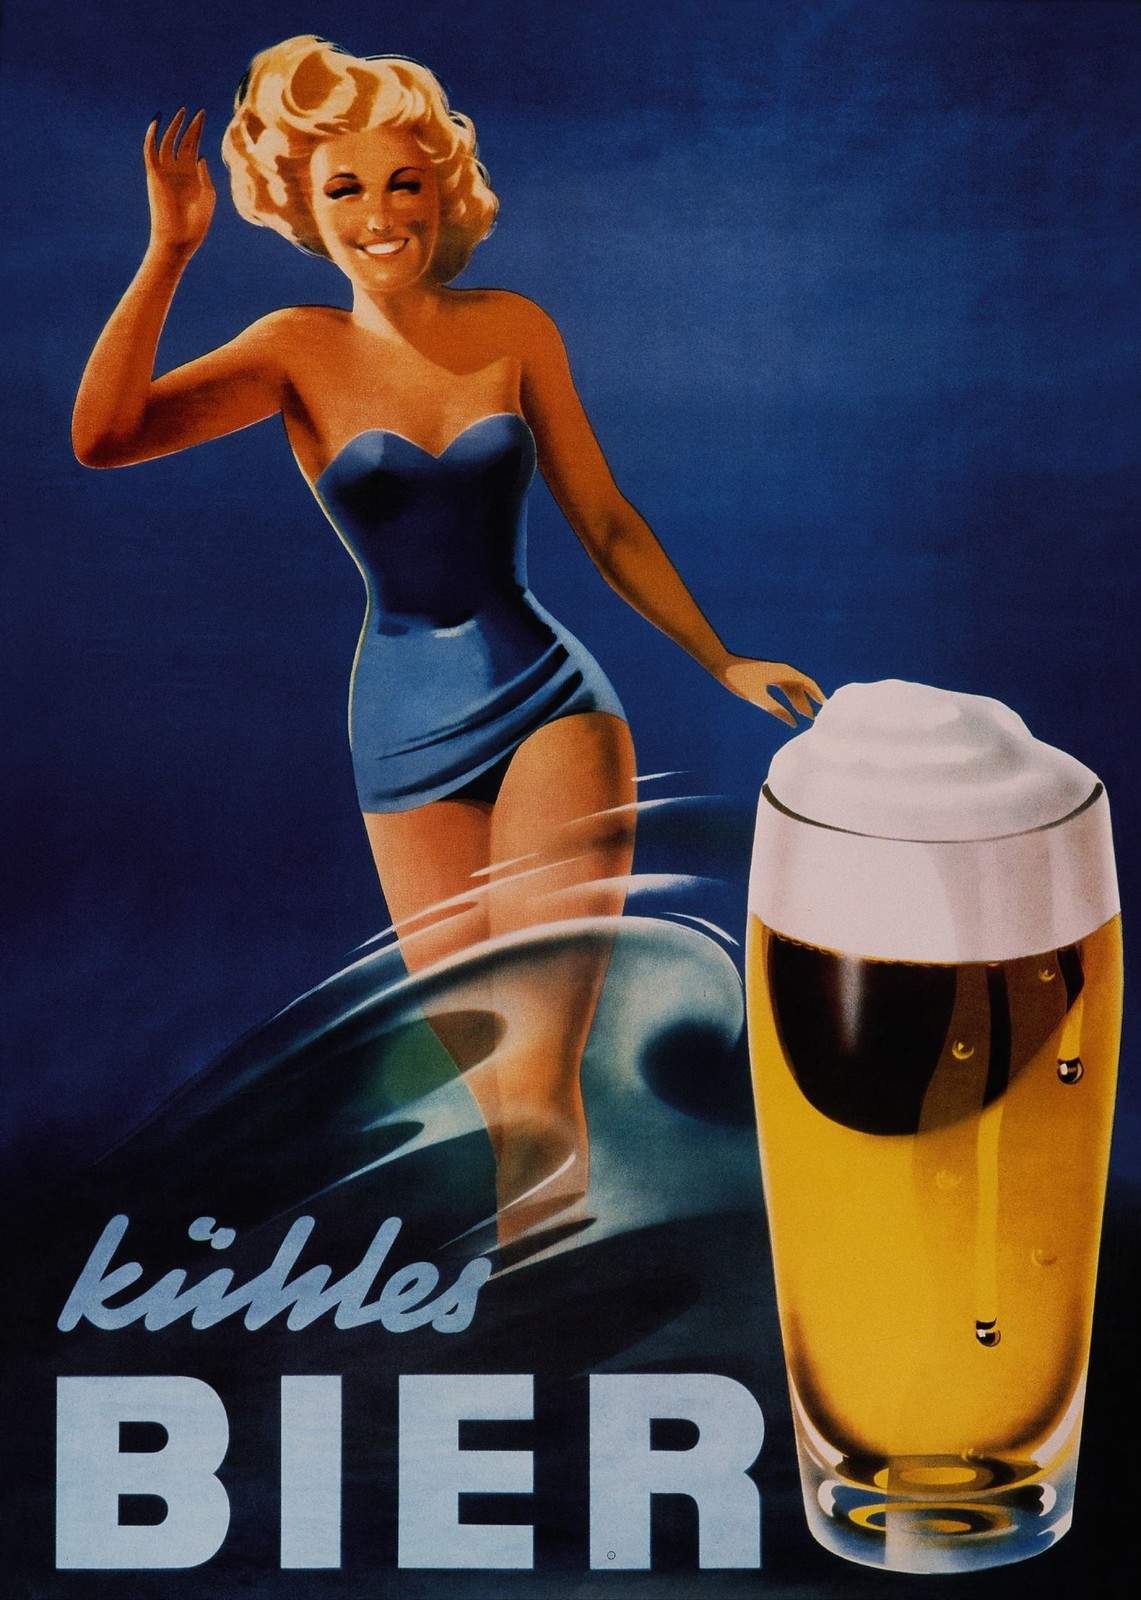 Kuhles-Bier-babe